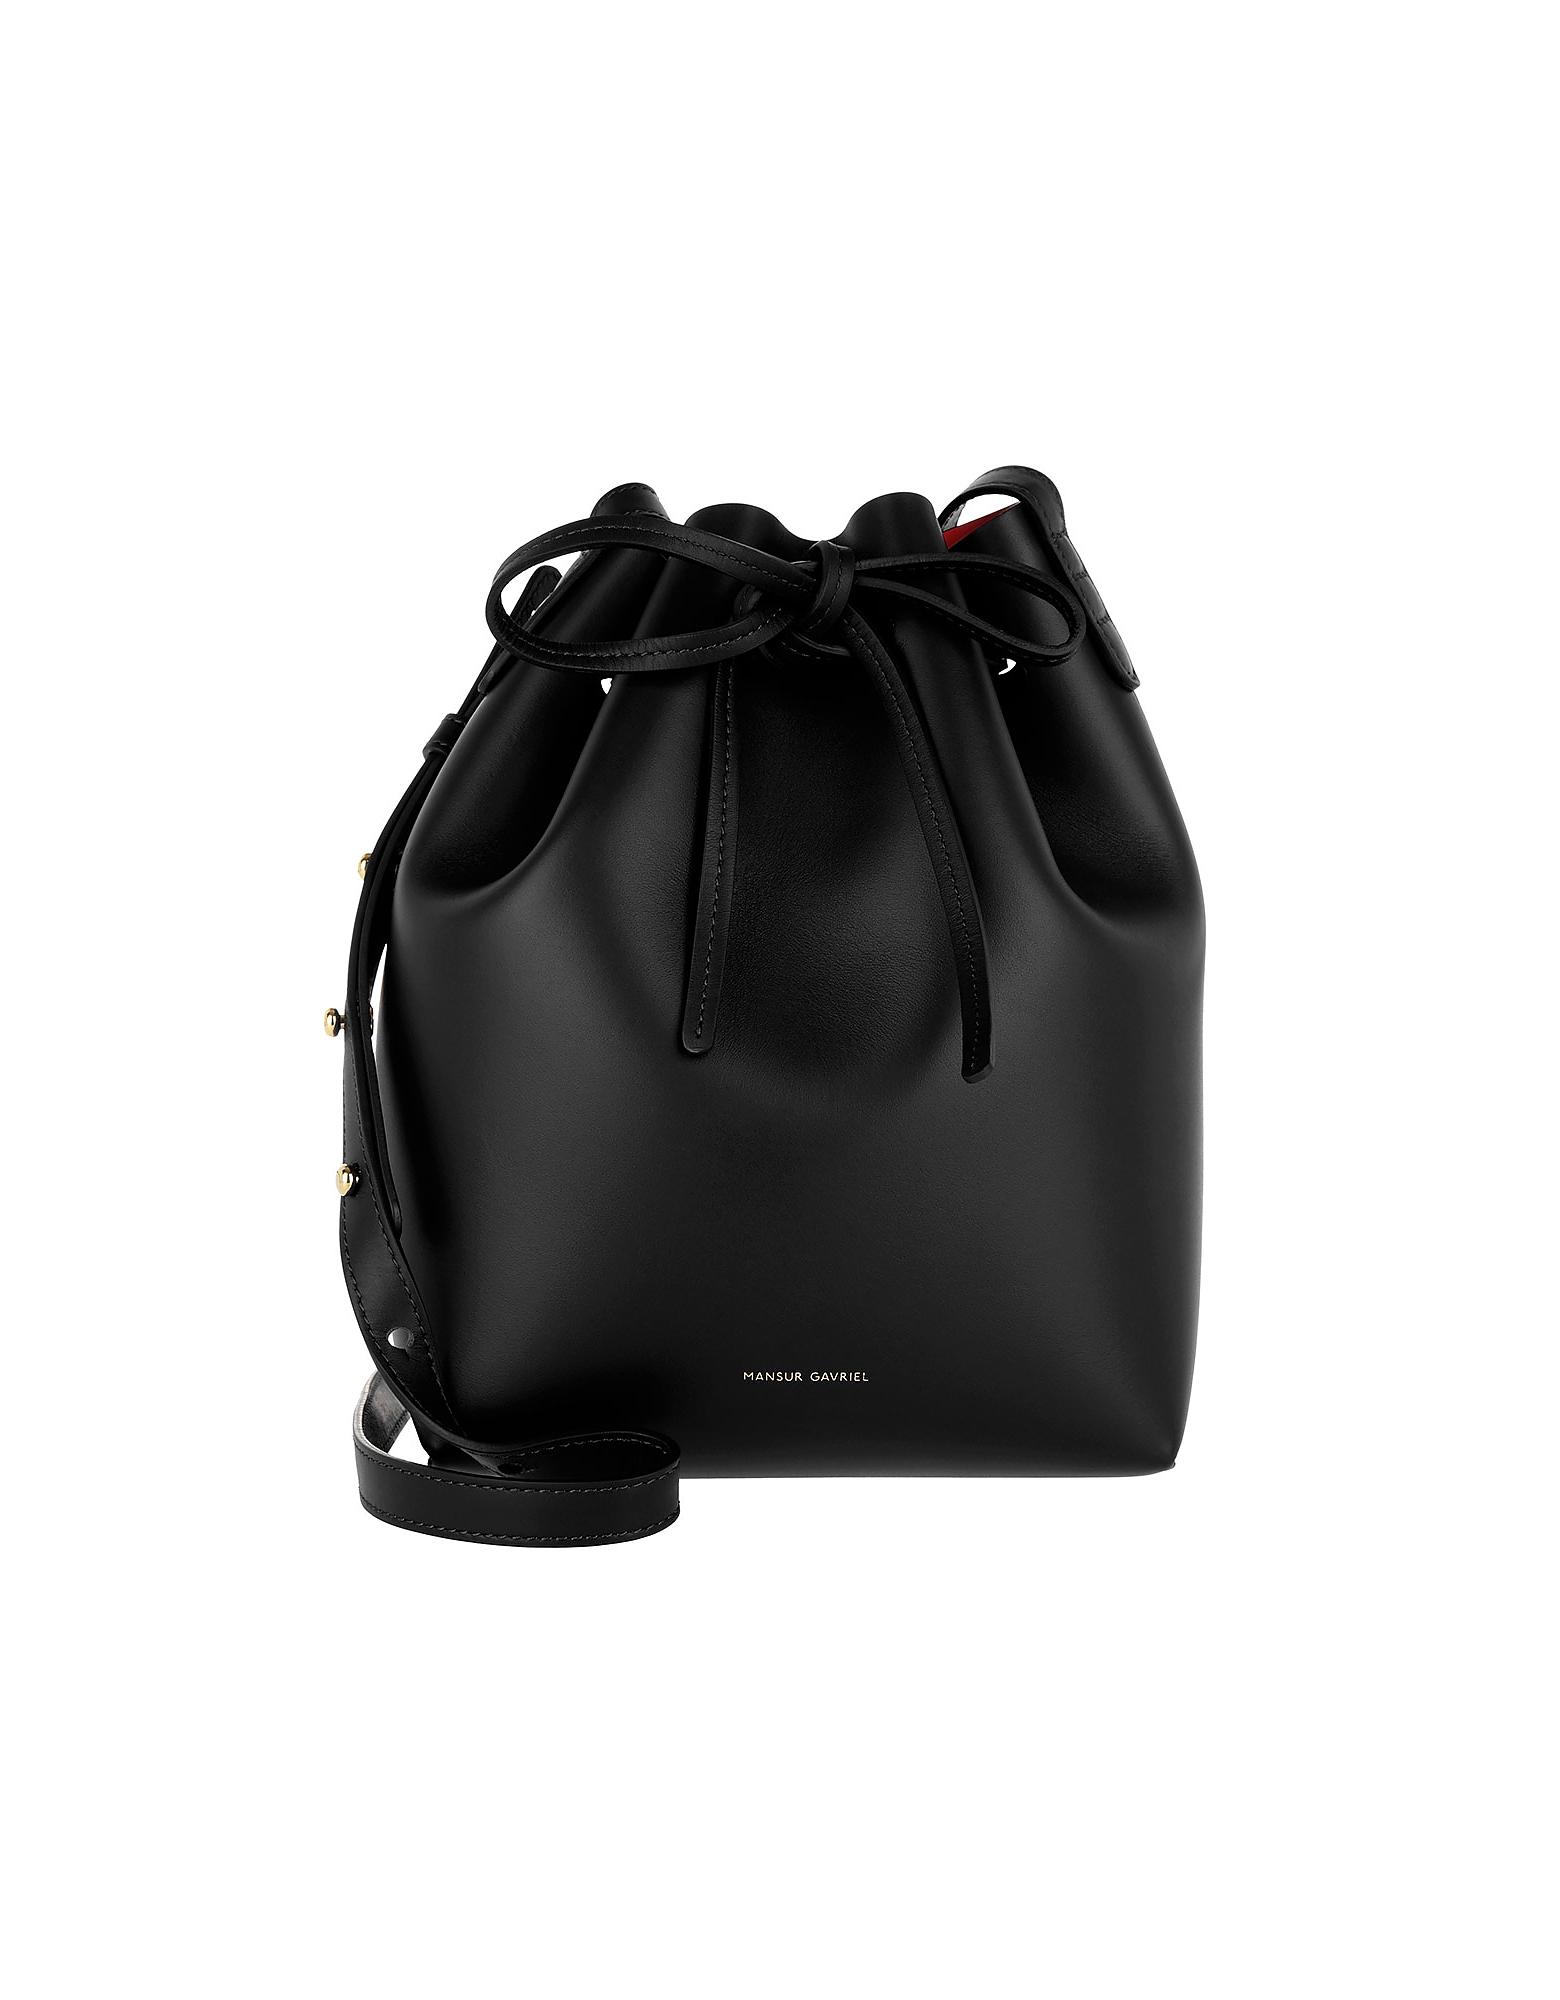 Mansur Gavriel Handbags, Mini Bucket Bag Black Flamma